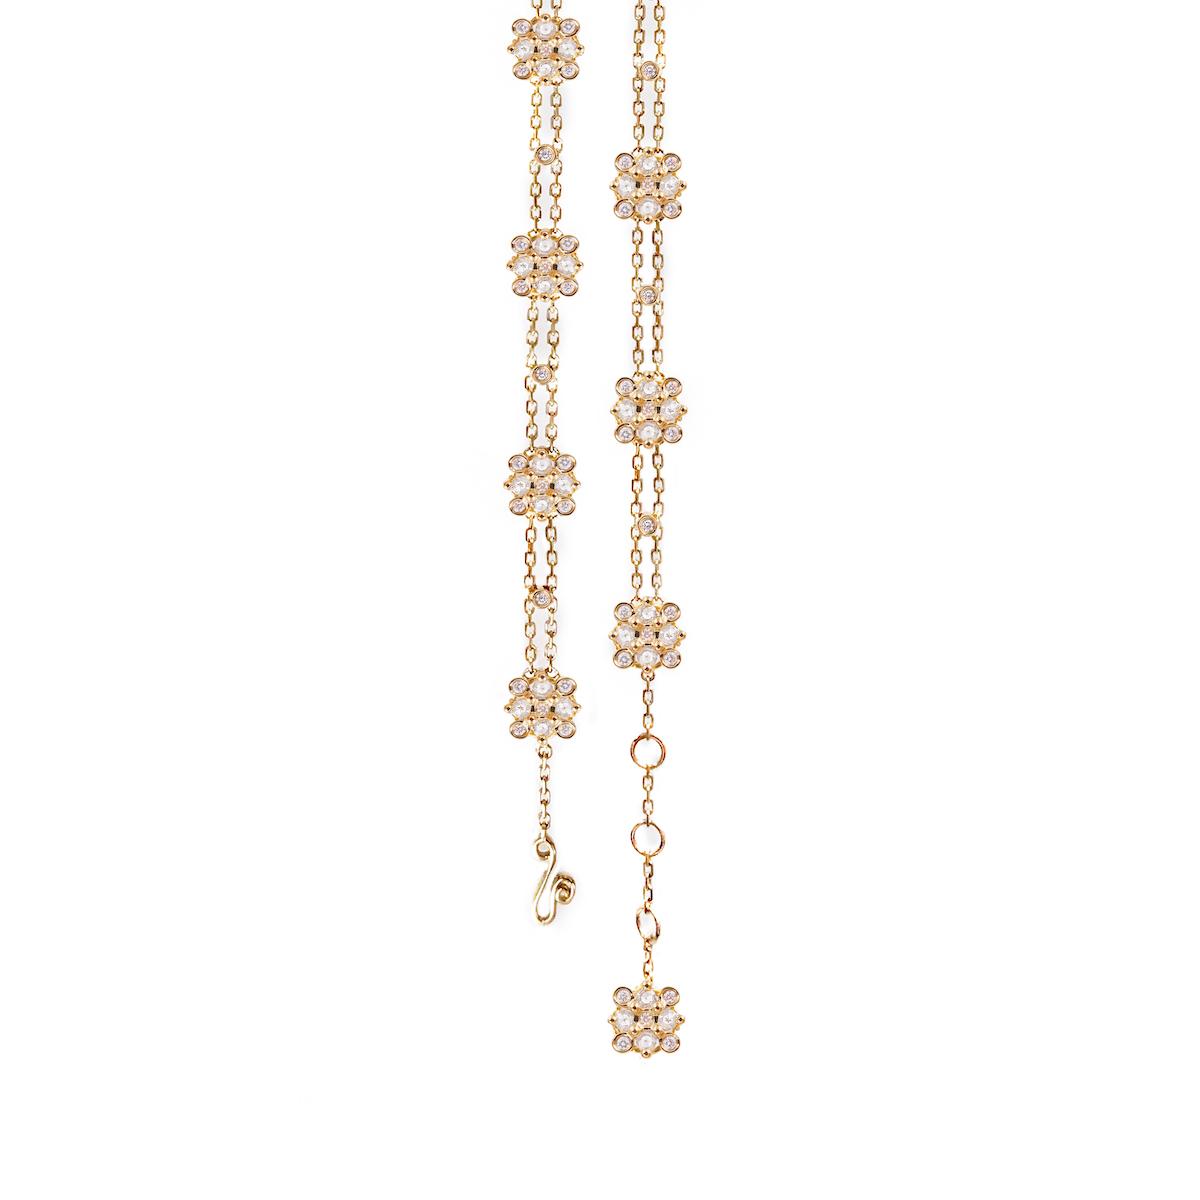 106 Rose-Cut-Diamond-Square-Checker-Cluster-Gold-Station-Chain-Bracelet-14k-18k-JeweLyrieV copy